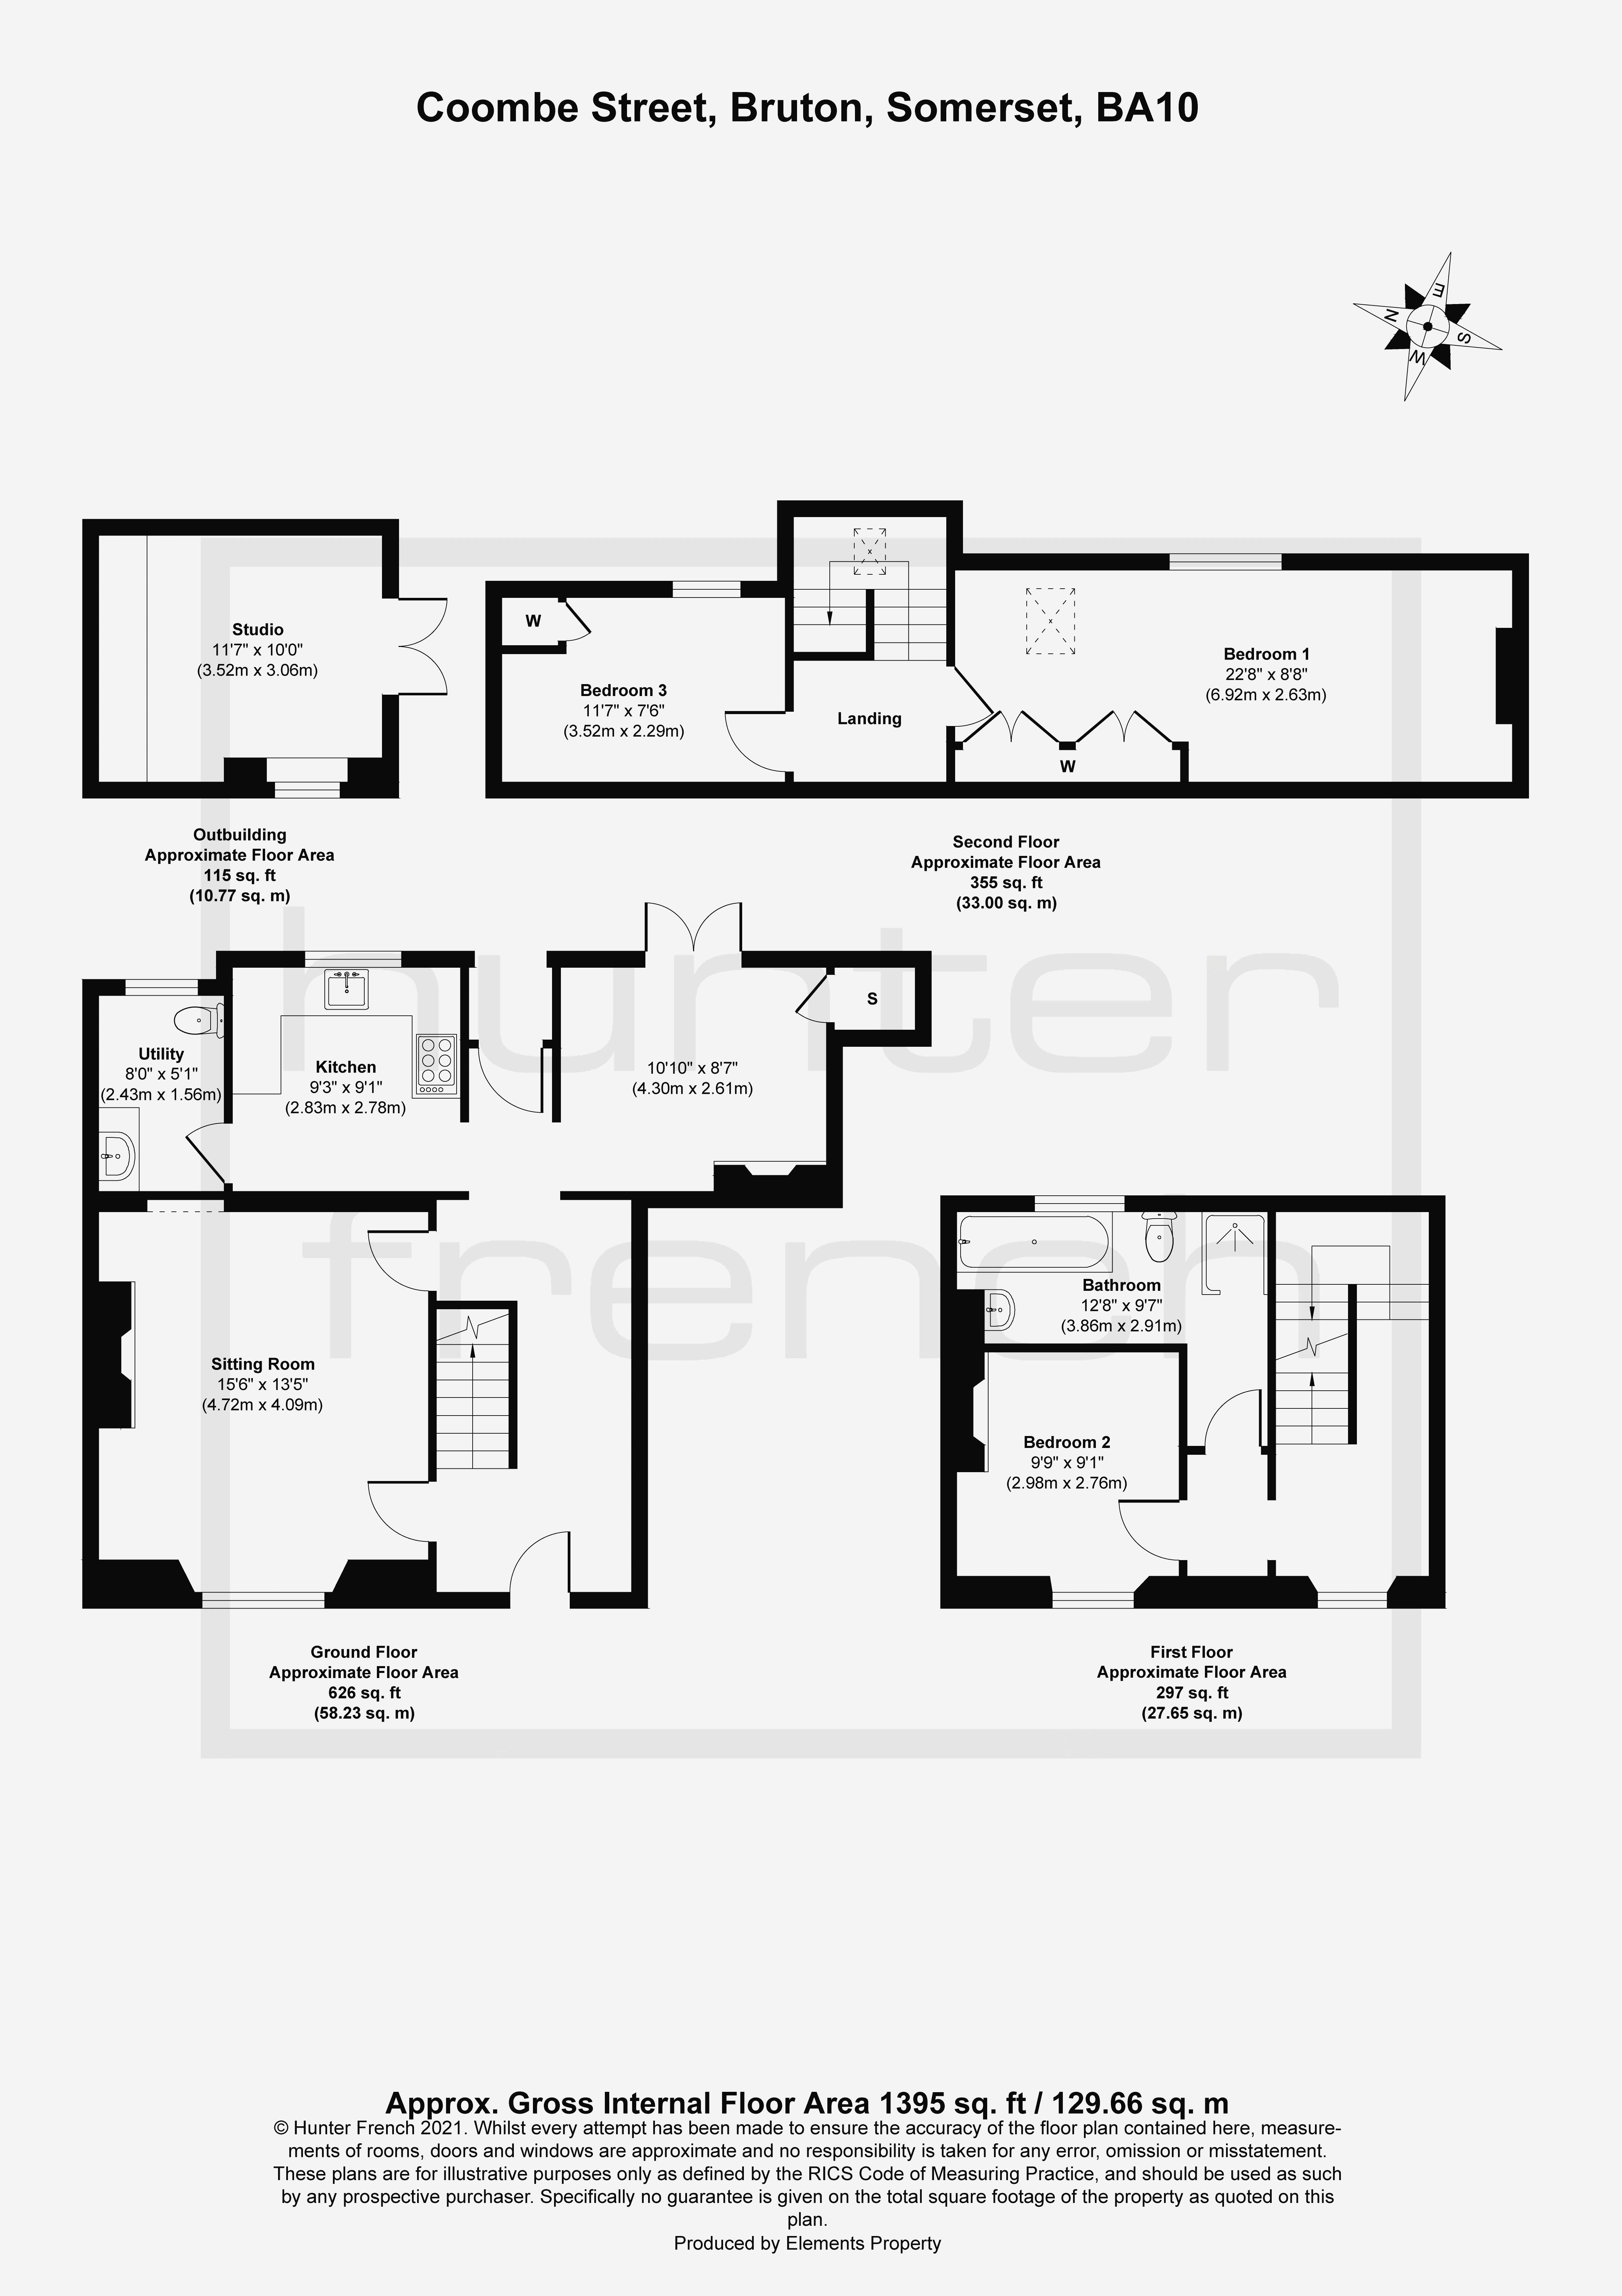 7 Coombe Street Floorplan